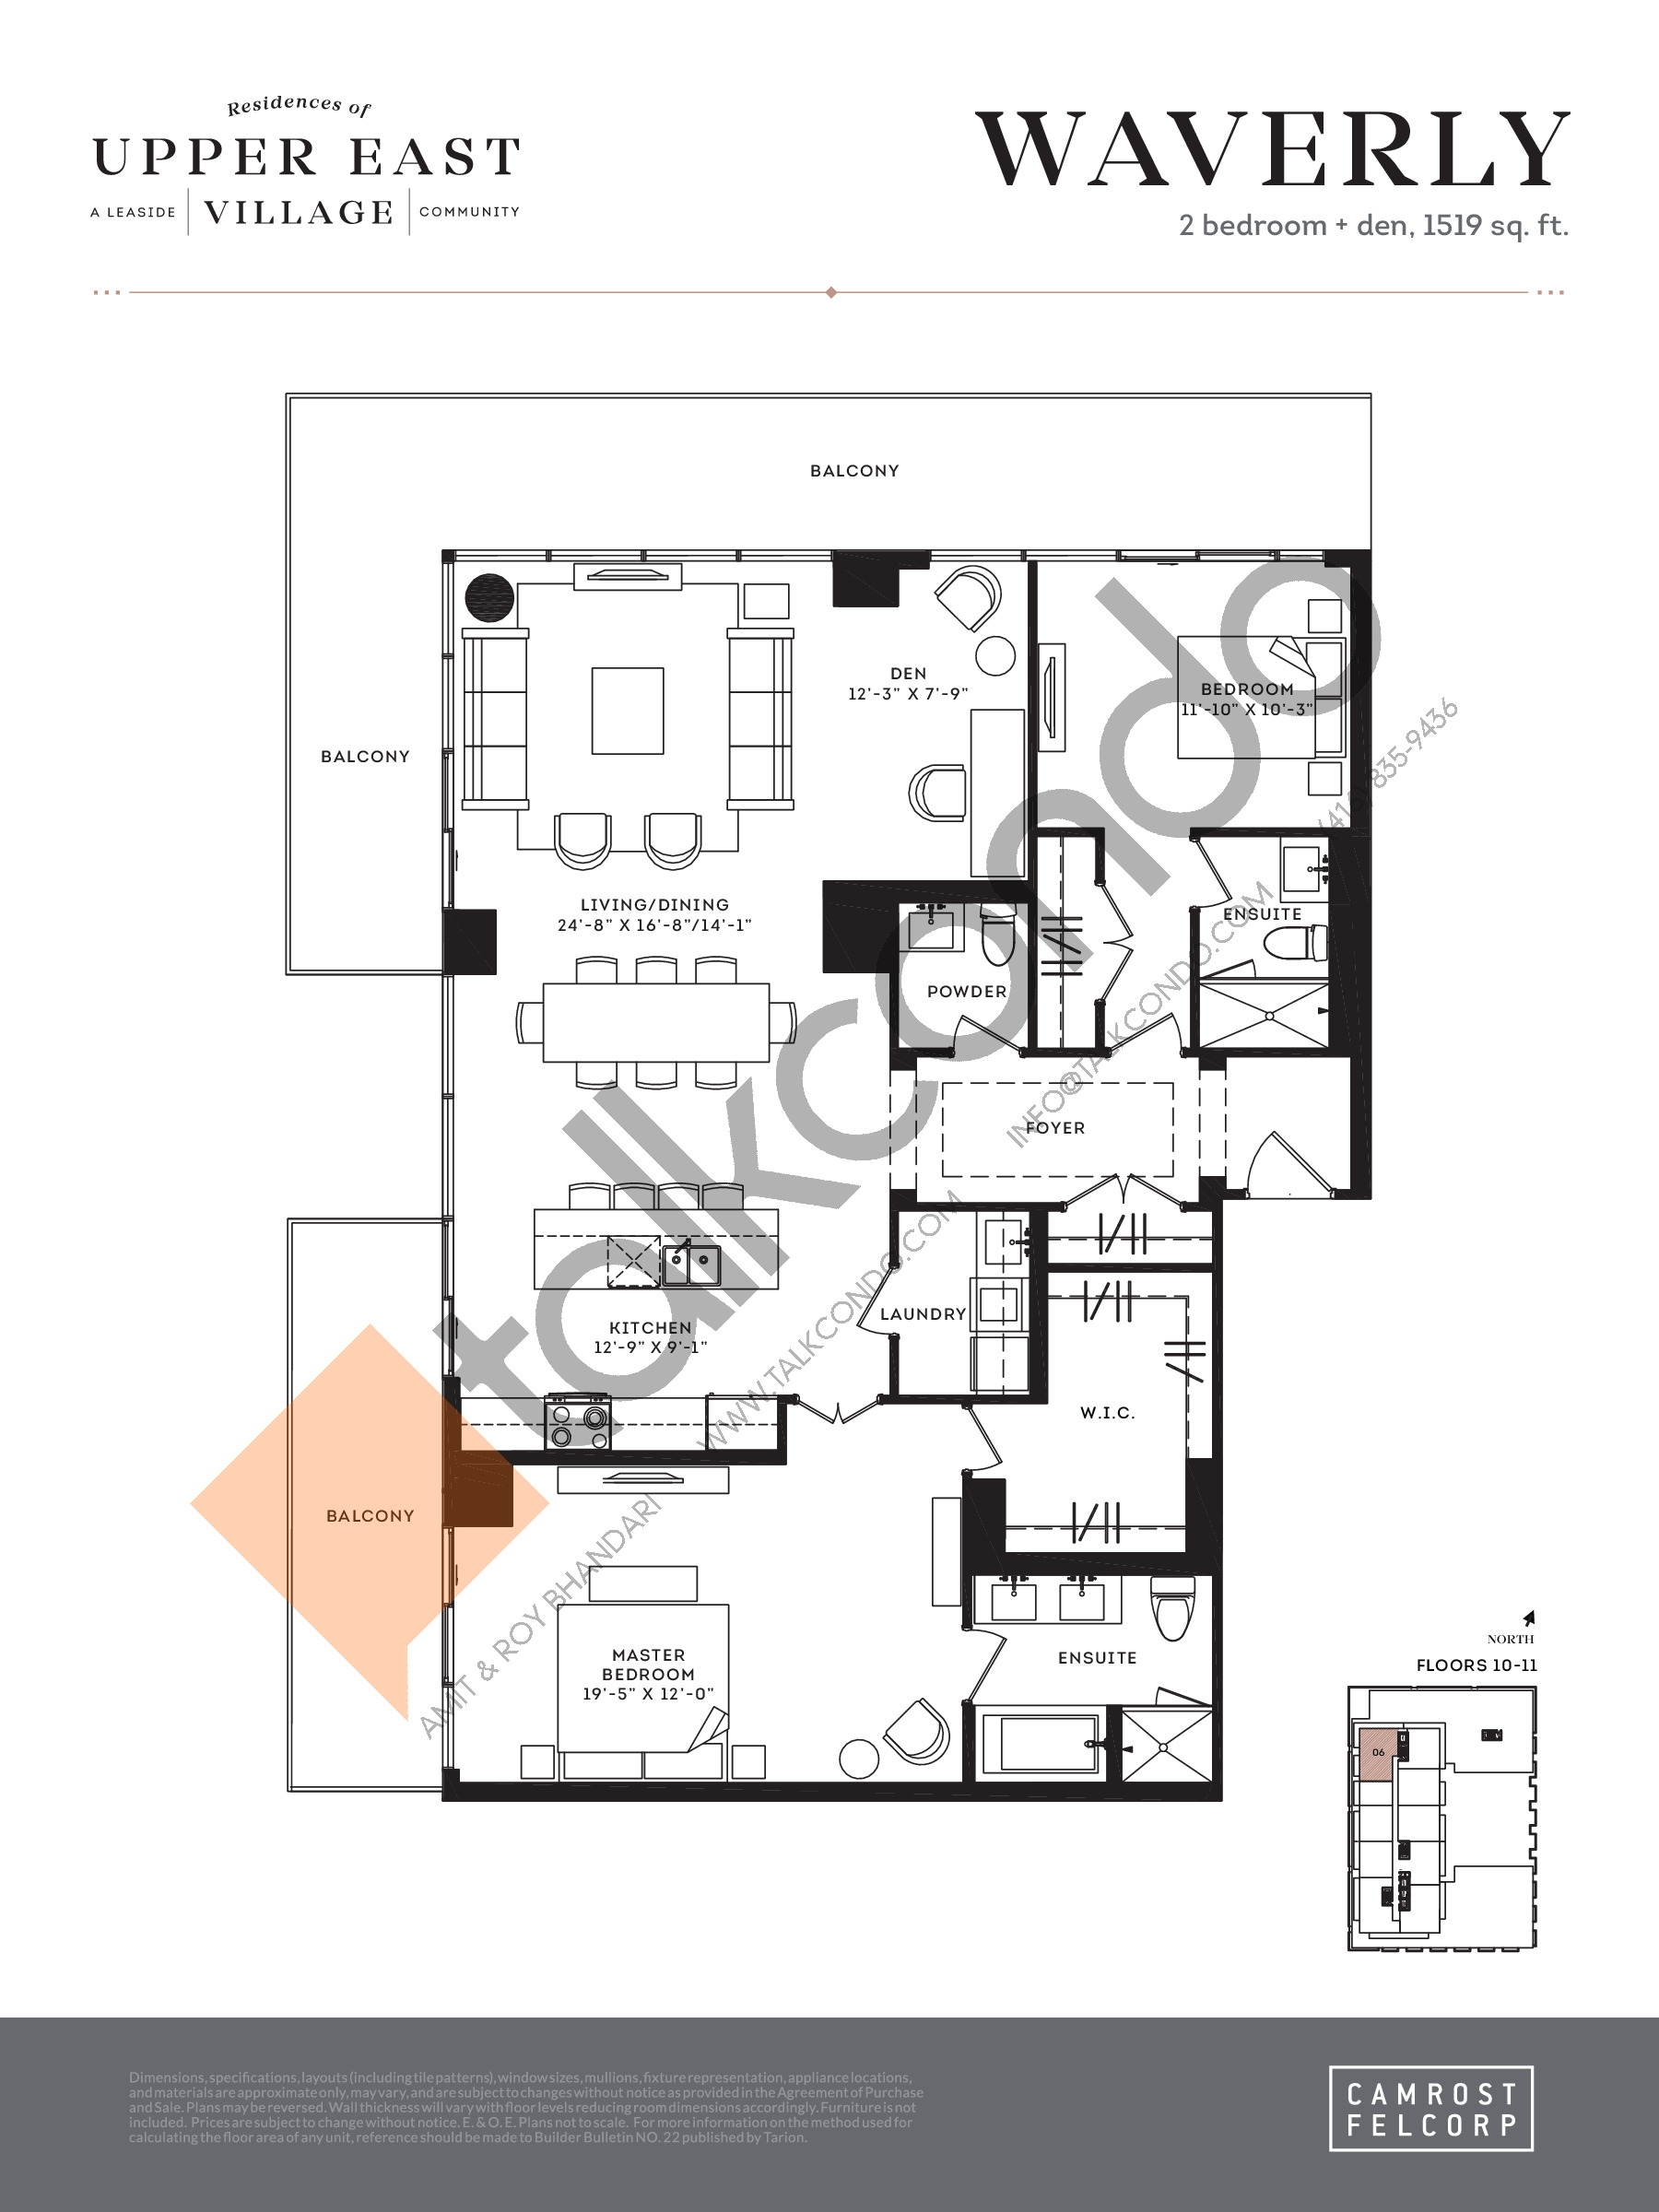 Waverly Floor Plan at Upper East Village Condos - 1519 sq.ft